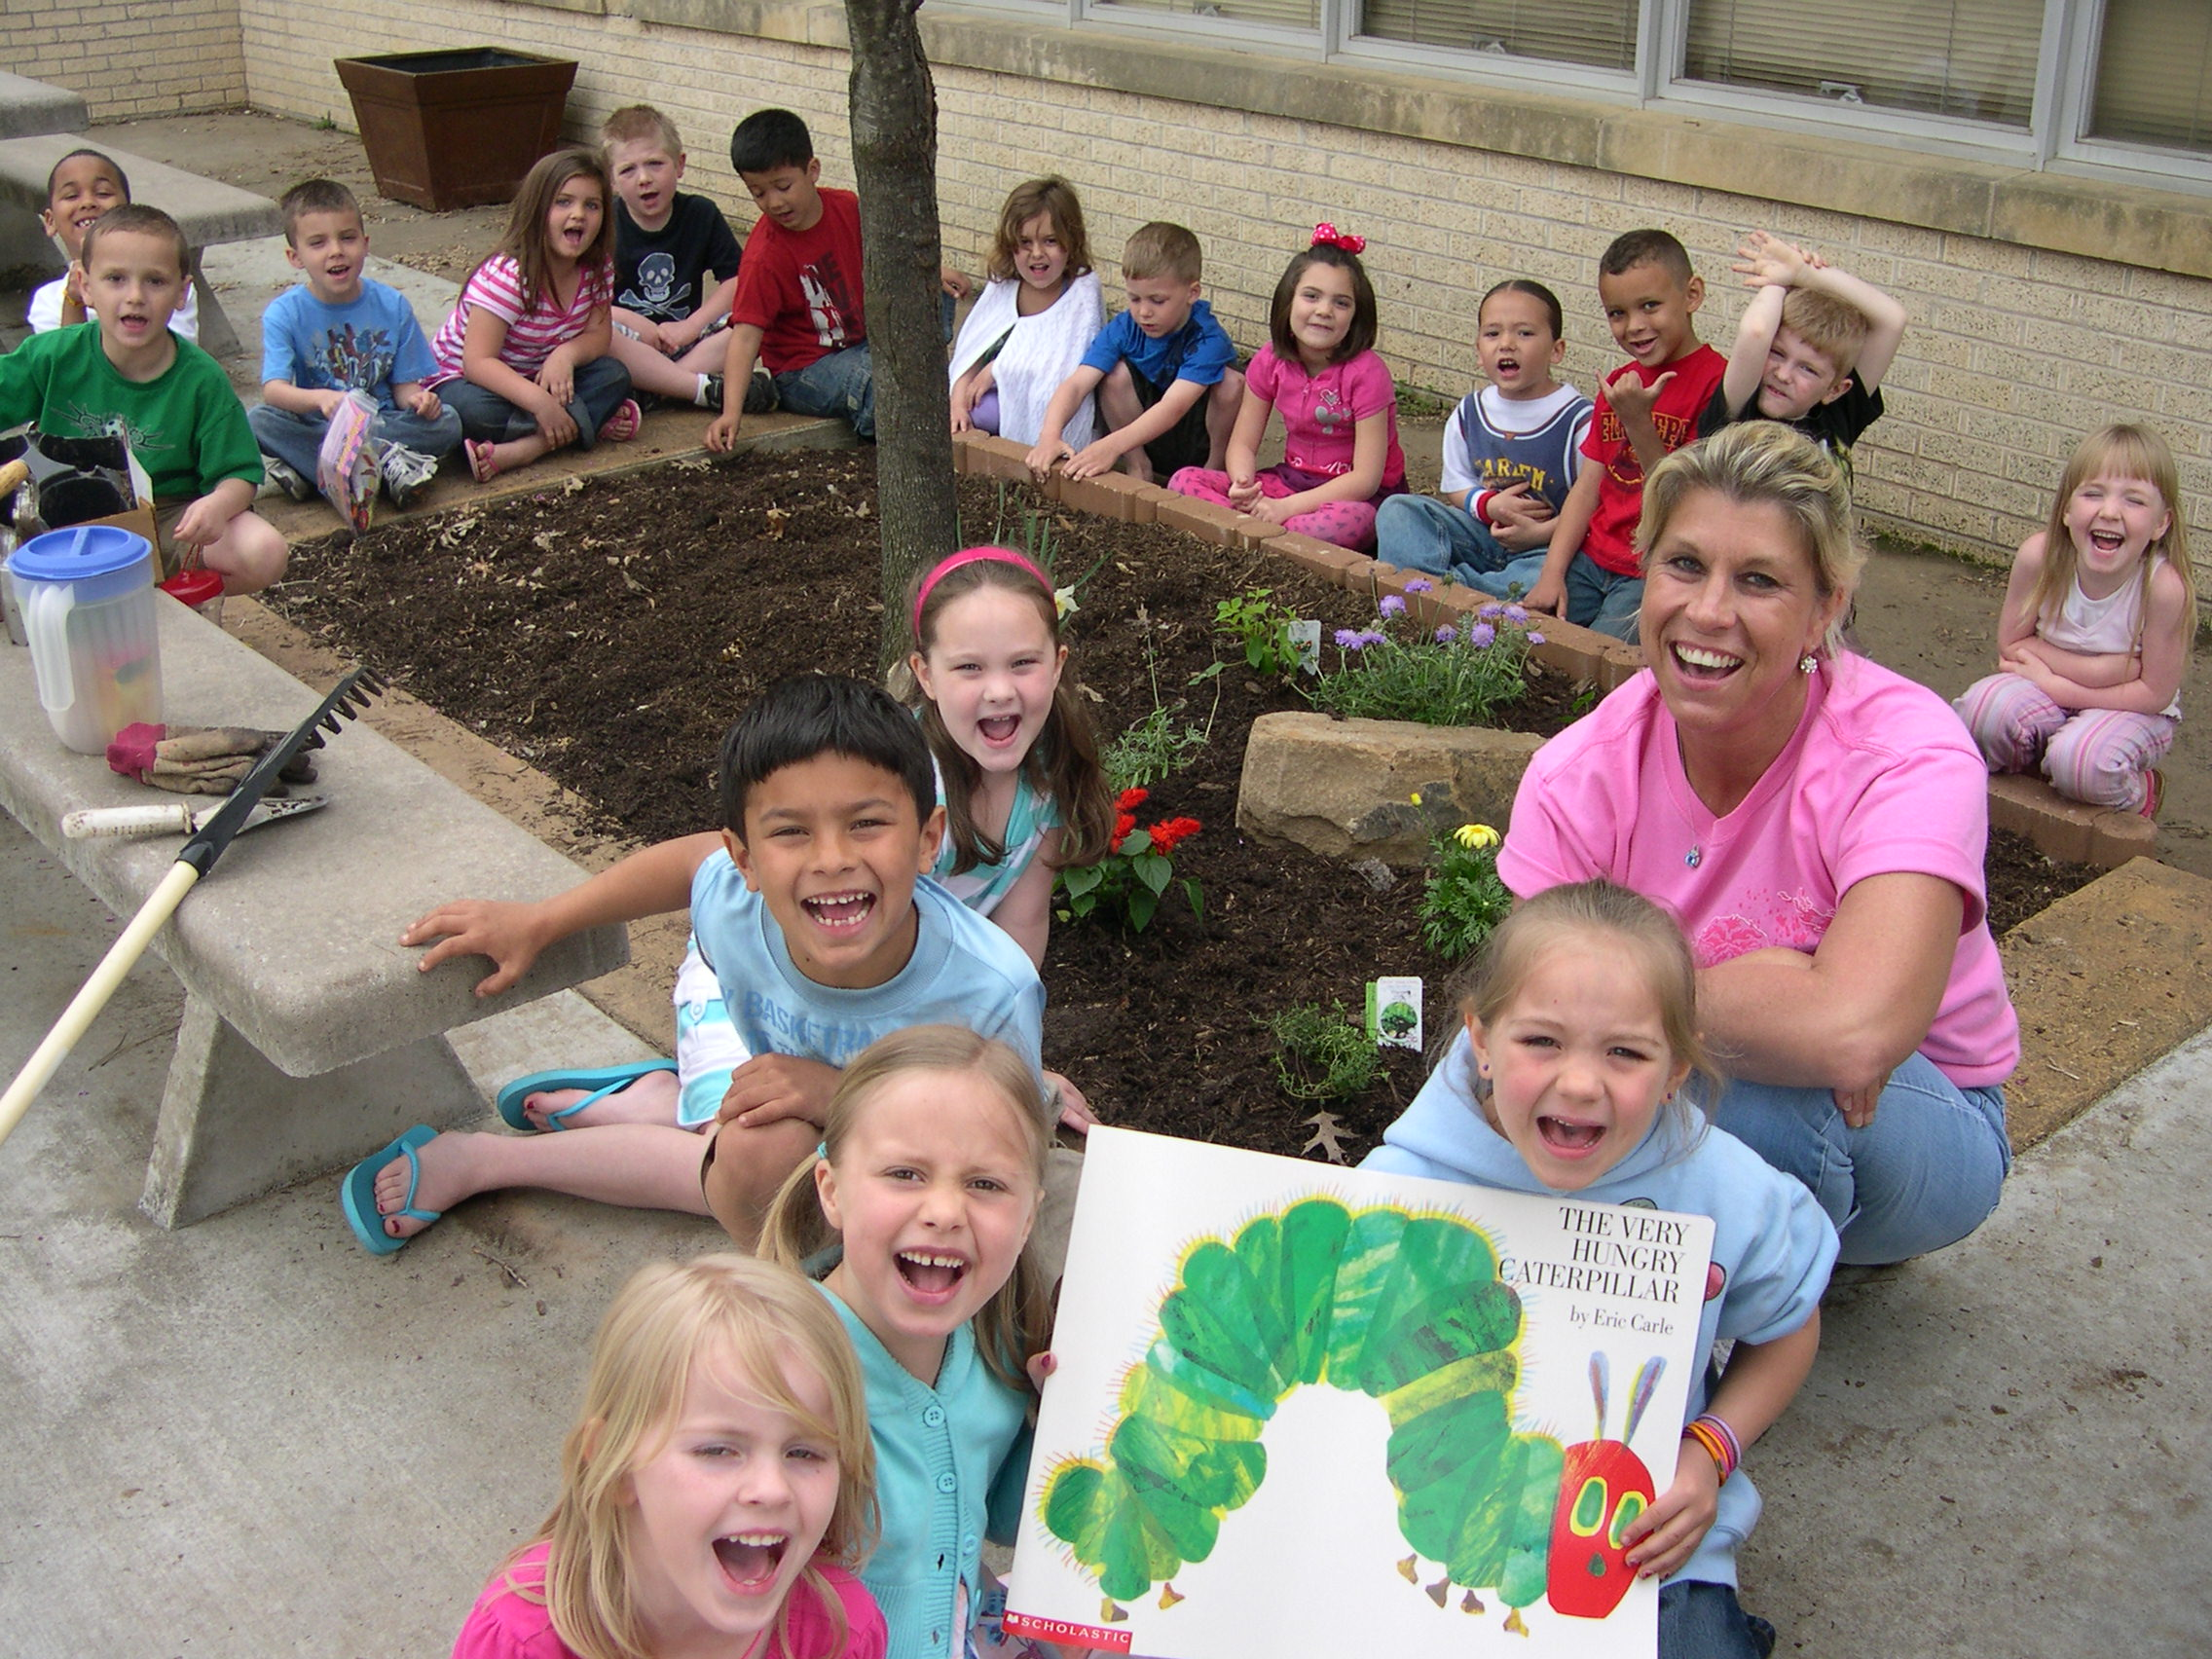 Tony Goetz students reading in their garden (Muskogee, 2009)